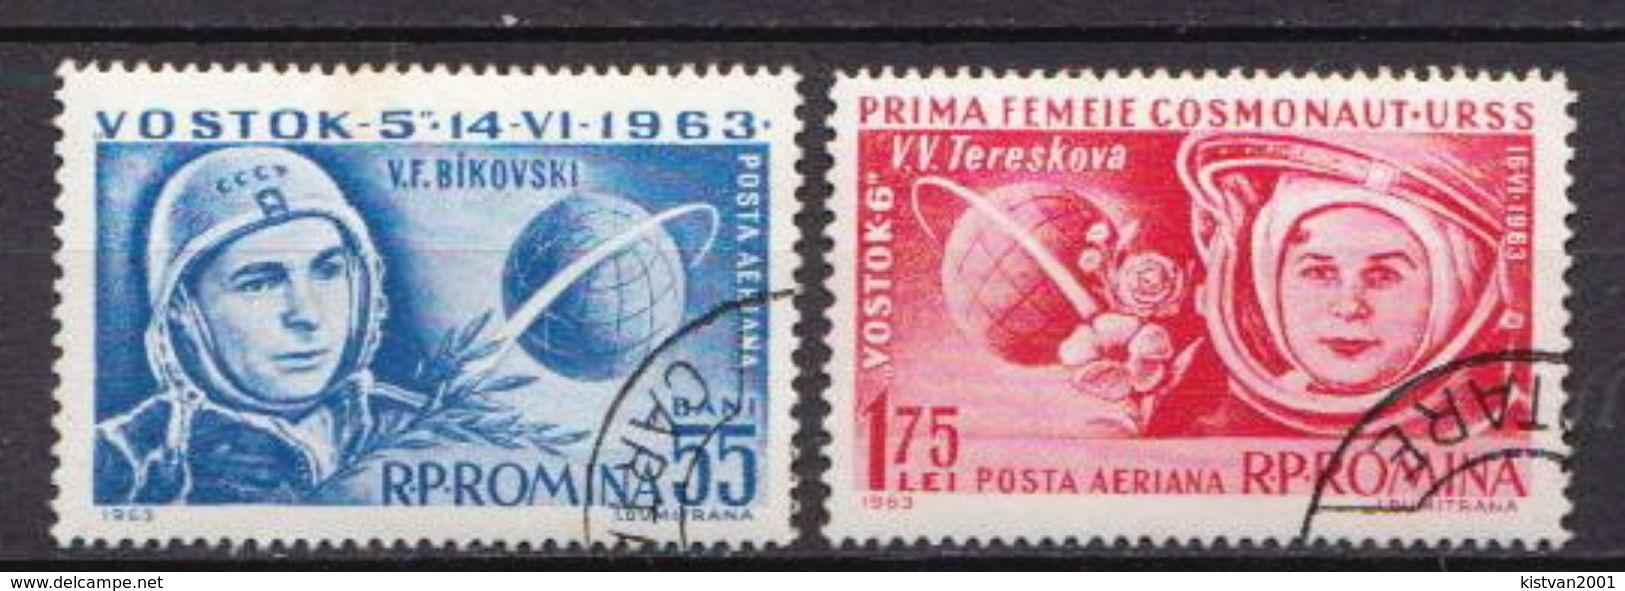 Romania Used Set - Space